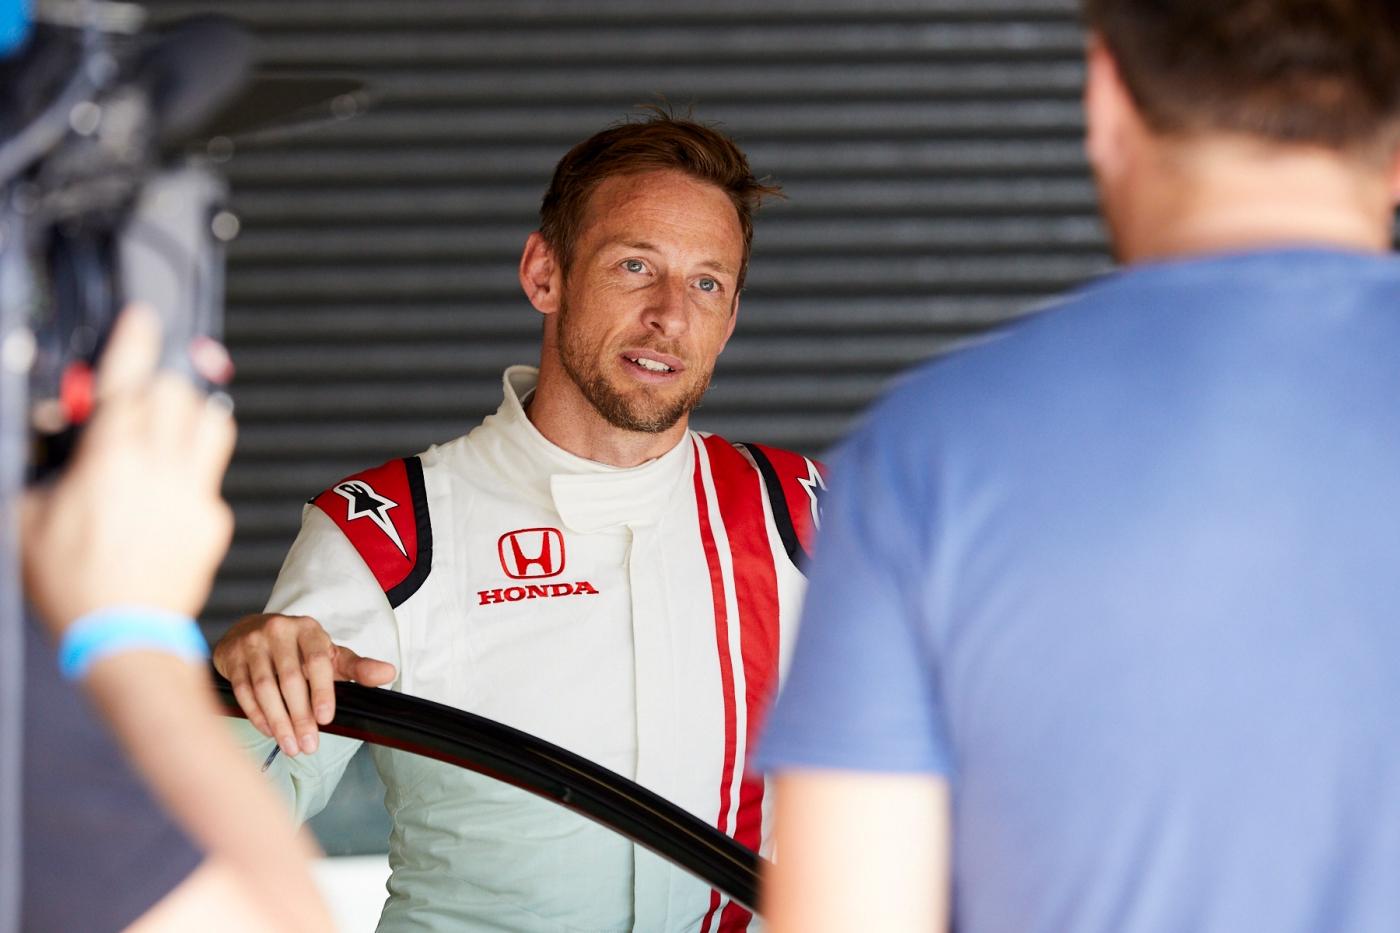 Jenson_Button_Bathurst_Honda_Civic_Type_R_0003